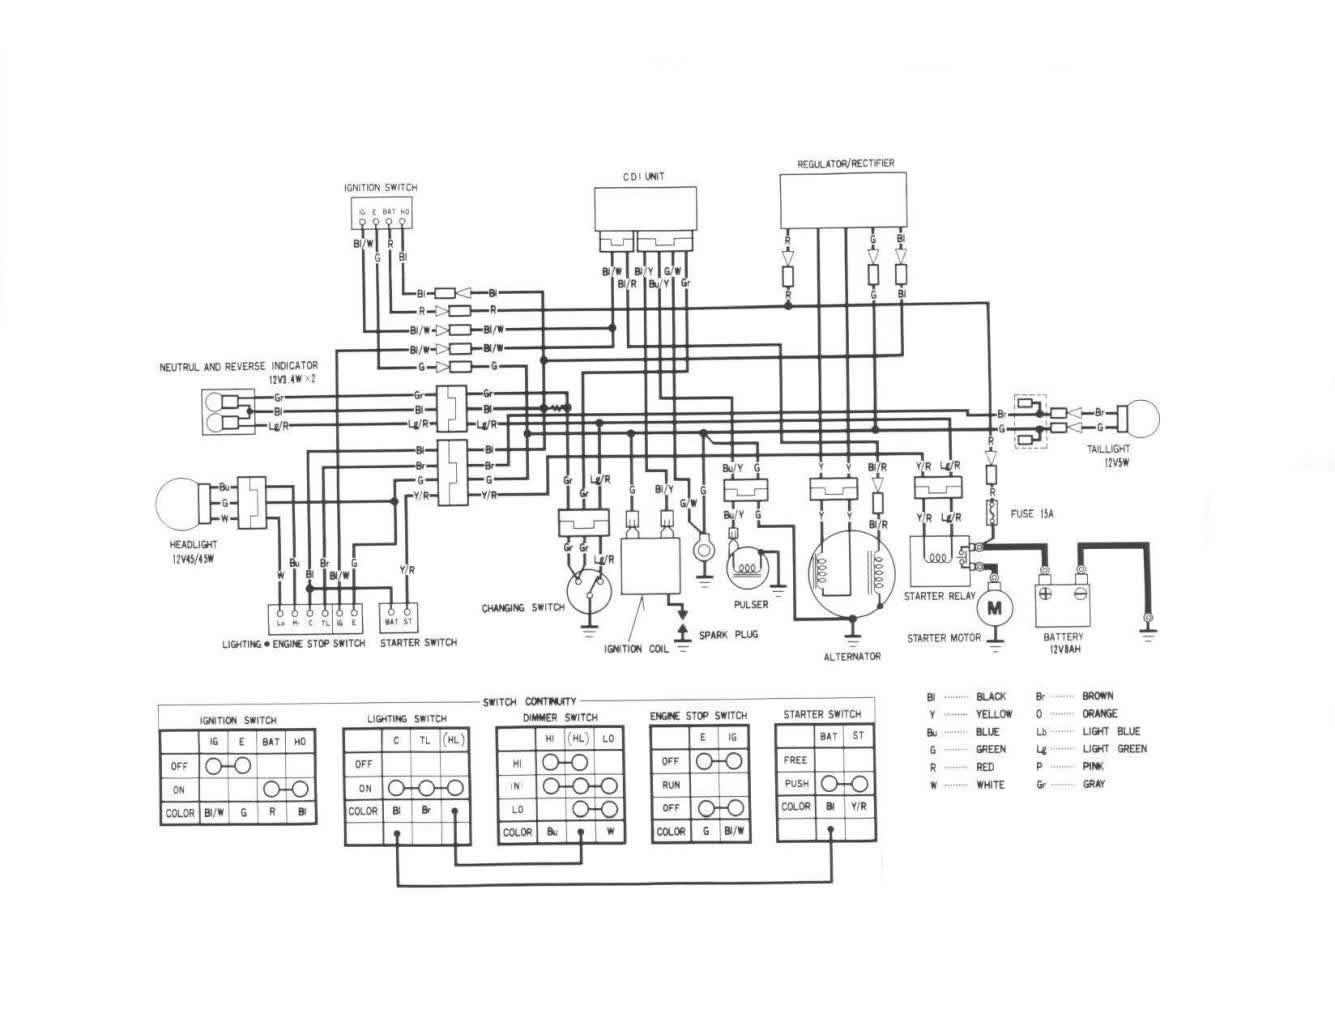 1987 yamaha banshee wiring diagram subwoofer home theater honda trx350d trx350tm